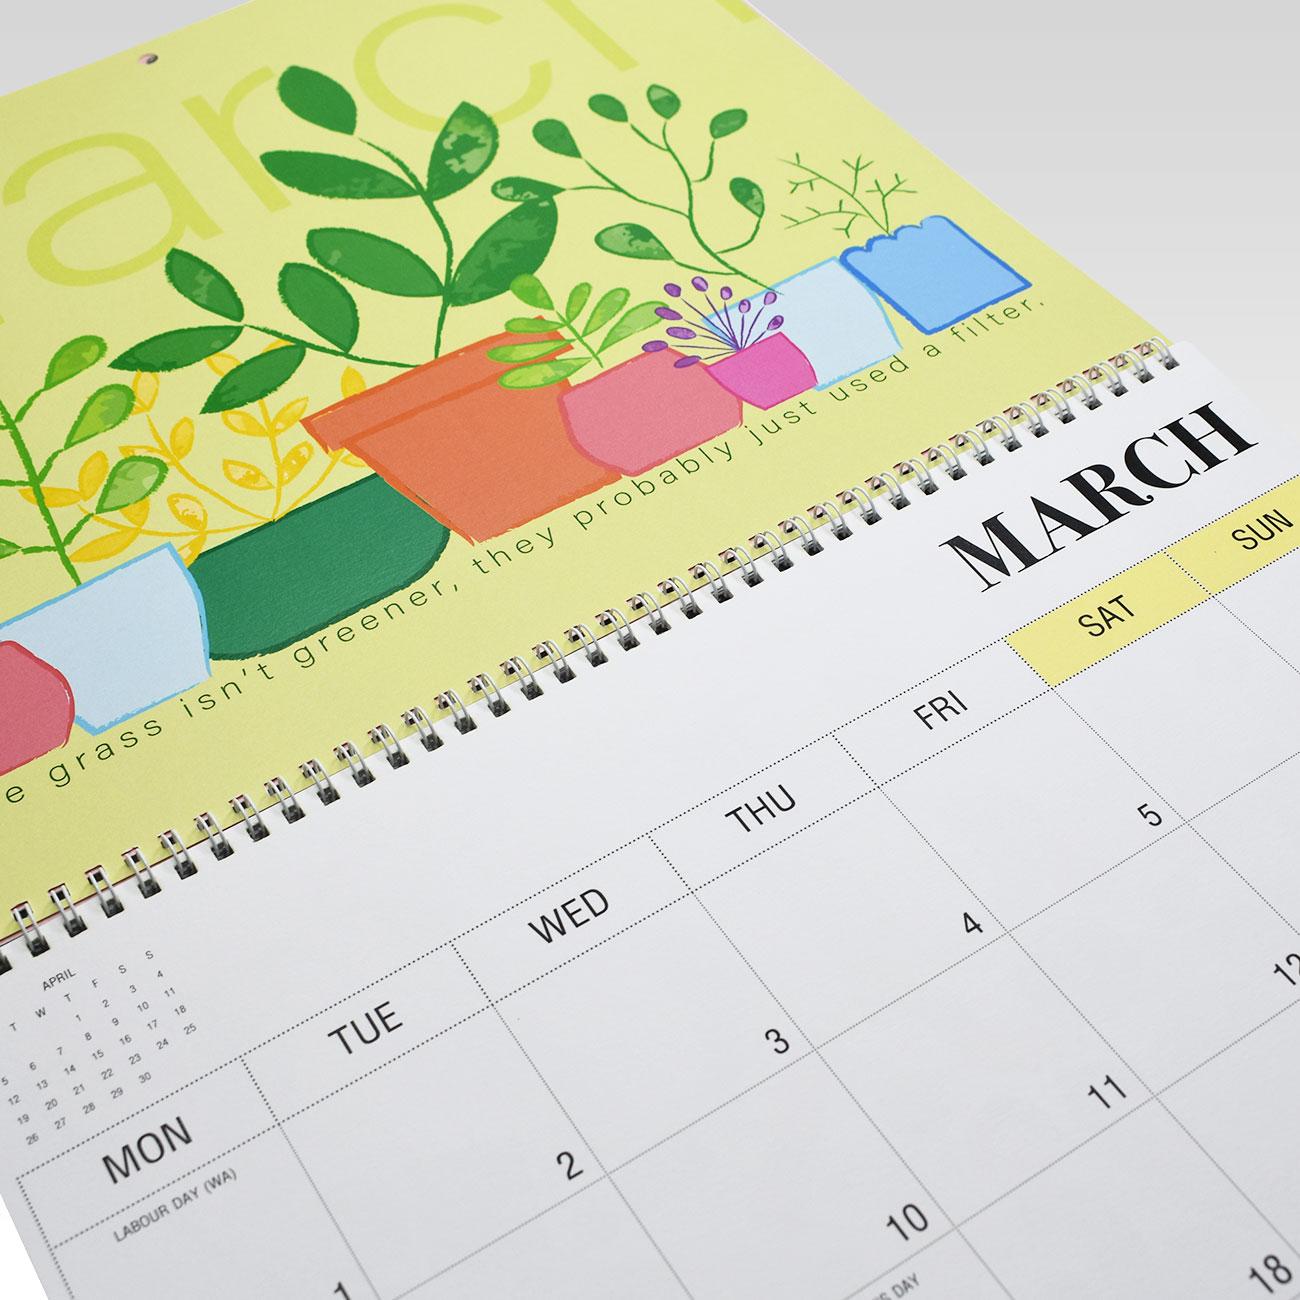 2021 Calendar - Rhicreative